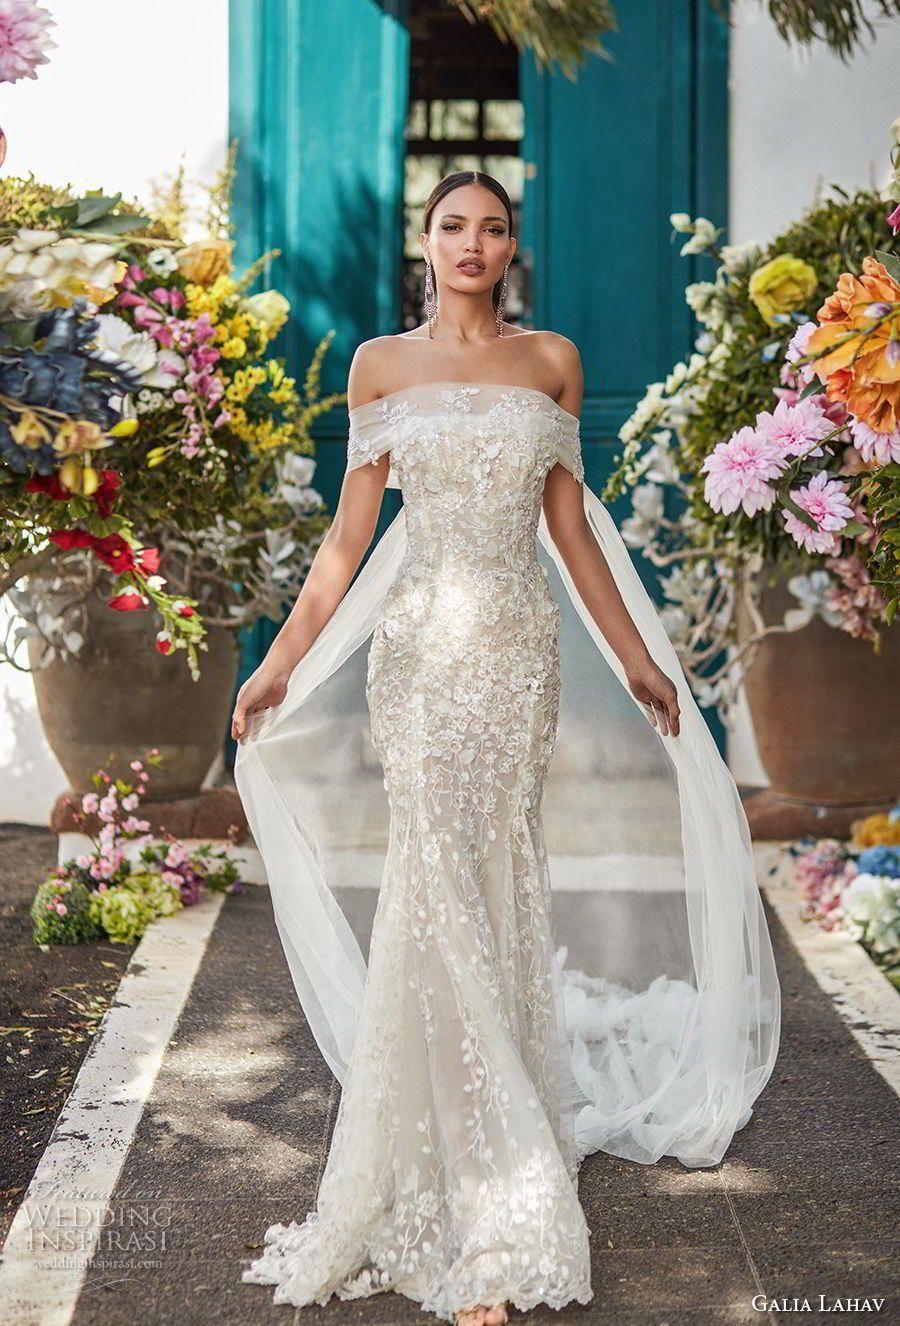 693b14c71475 galia lahav couture fall 2018 bridal off the shoulder straight across  neckline full embellishment elegant fit and flare wedding dress sweep train  (16) mv ...